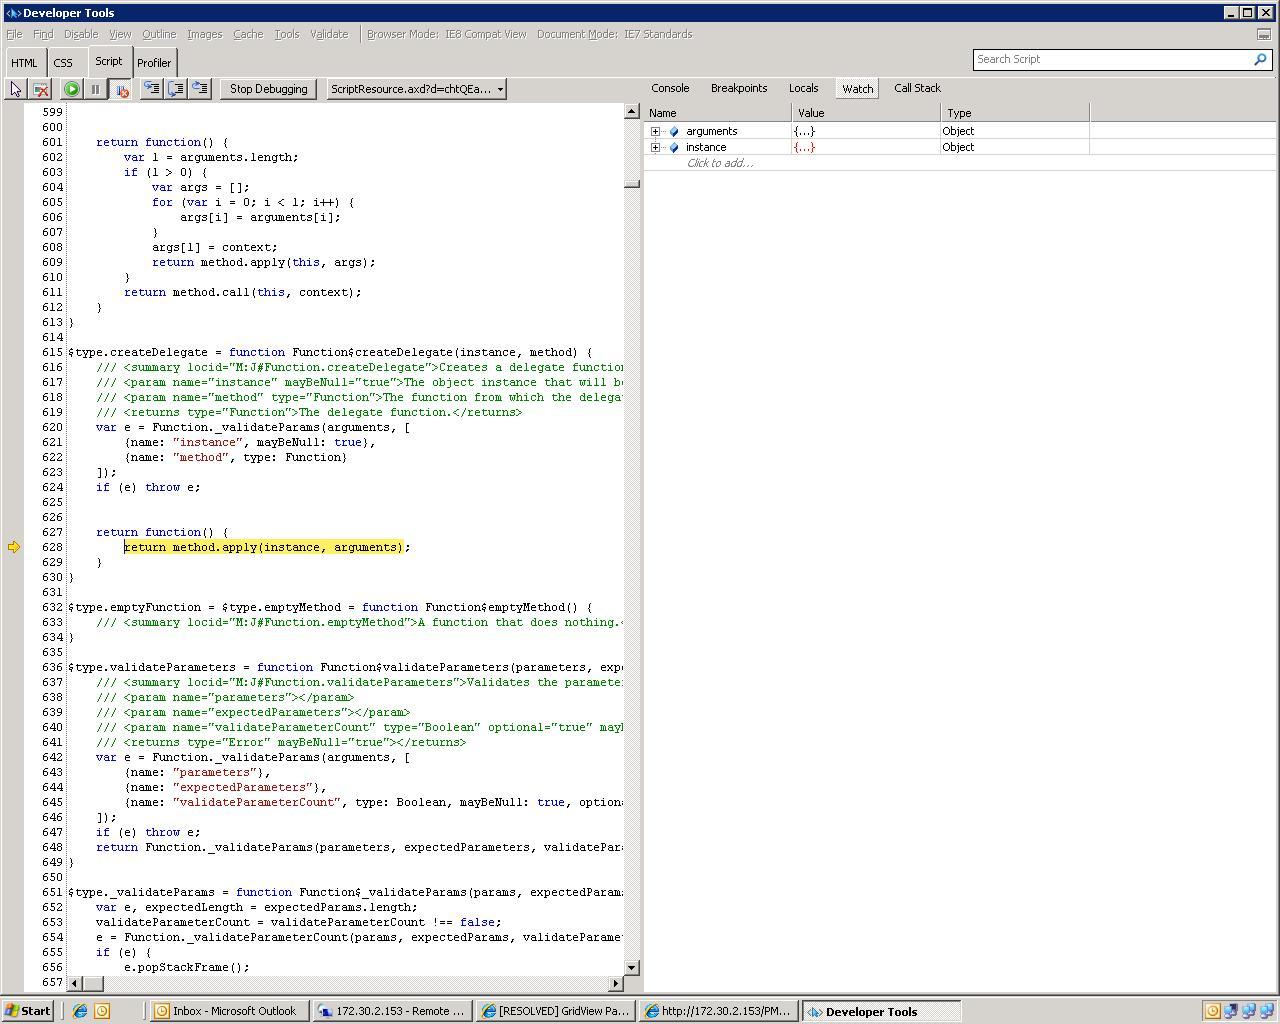 ScriptResourceaxd Problem In UI For ASPNET AJAX Dock